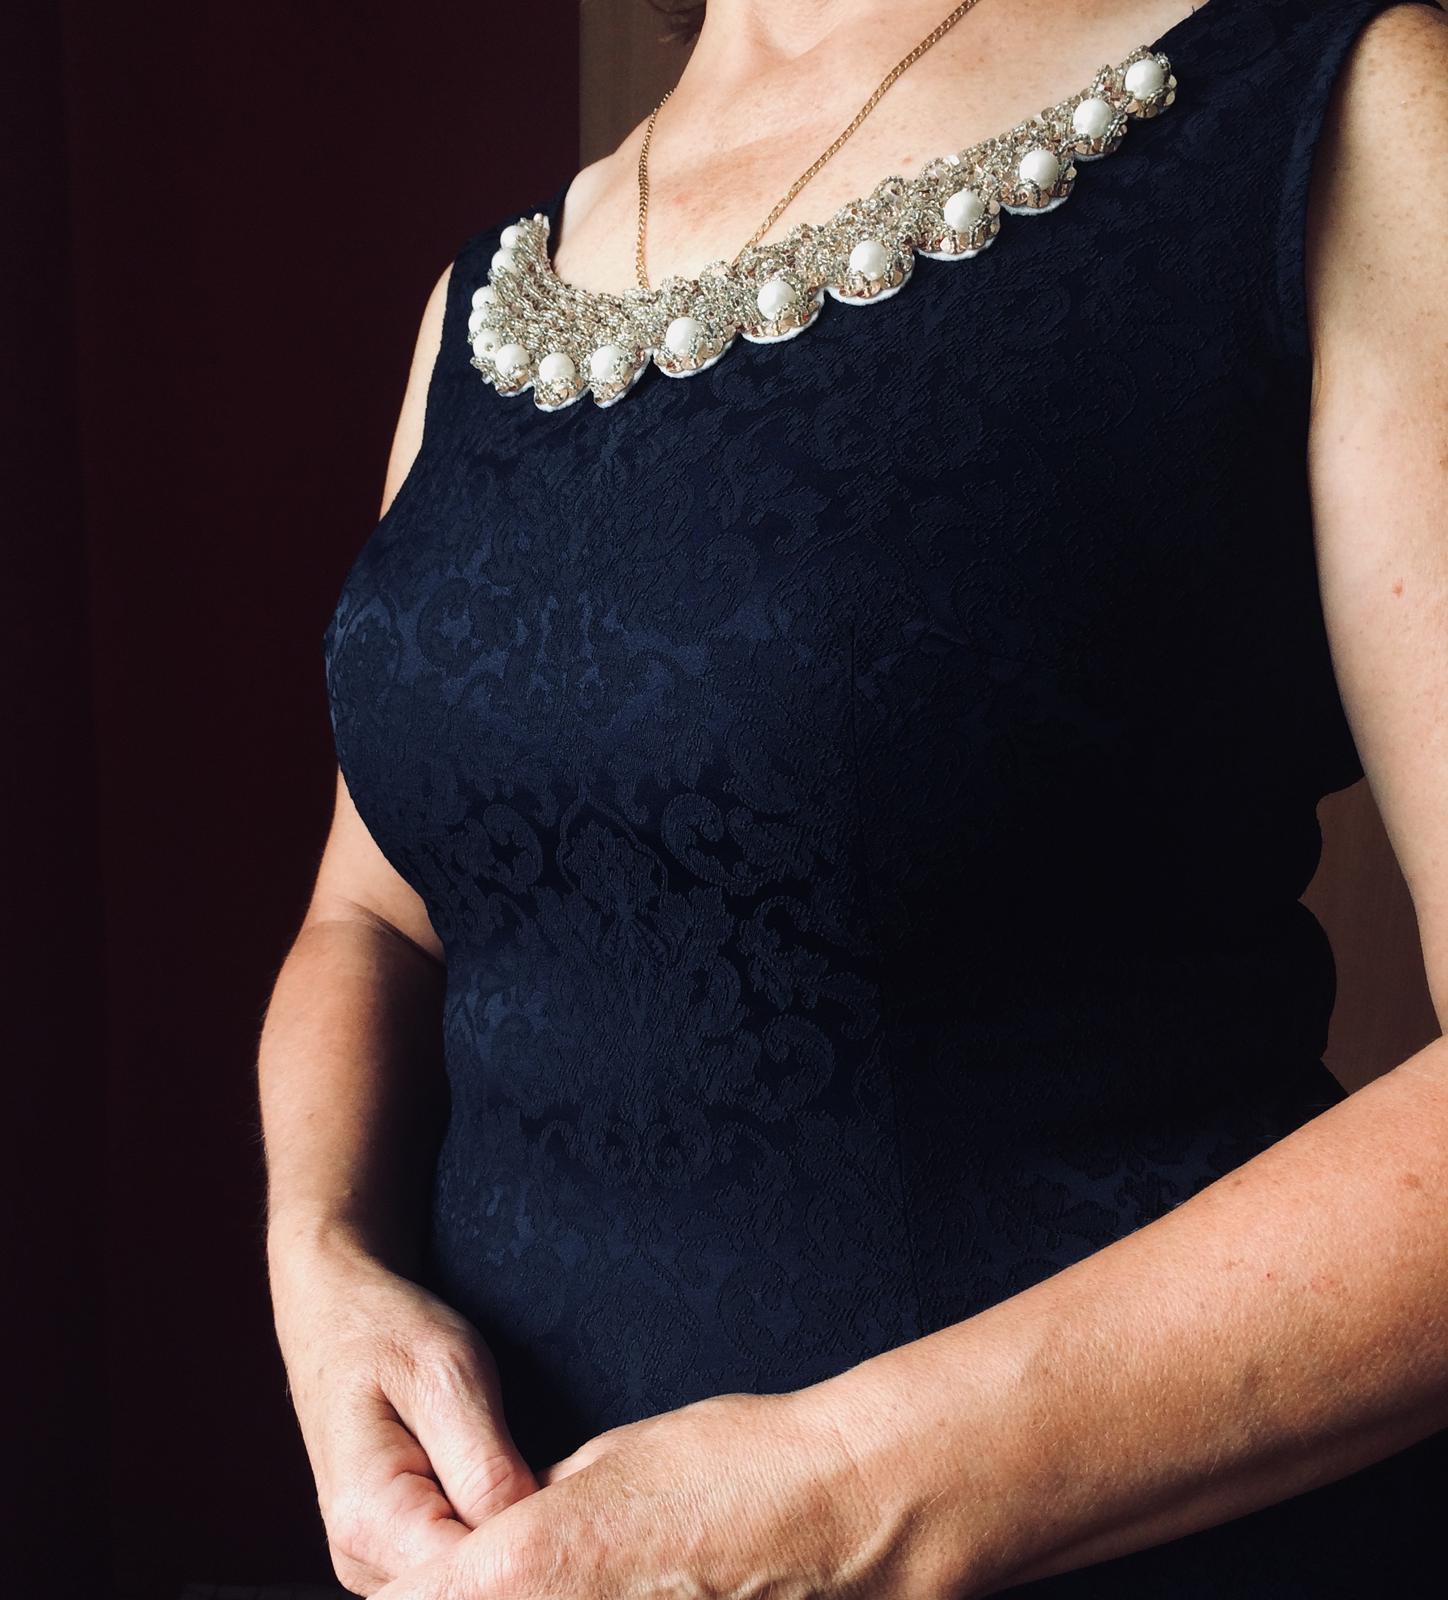 Kráľovsky modré šaty / 40 - Obrázok č. 1